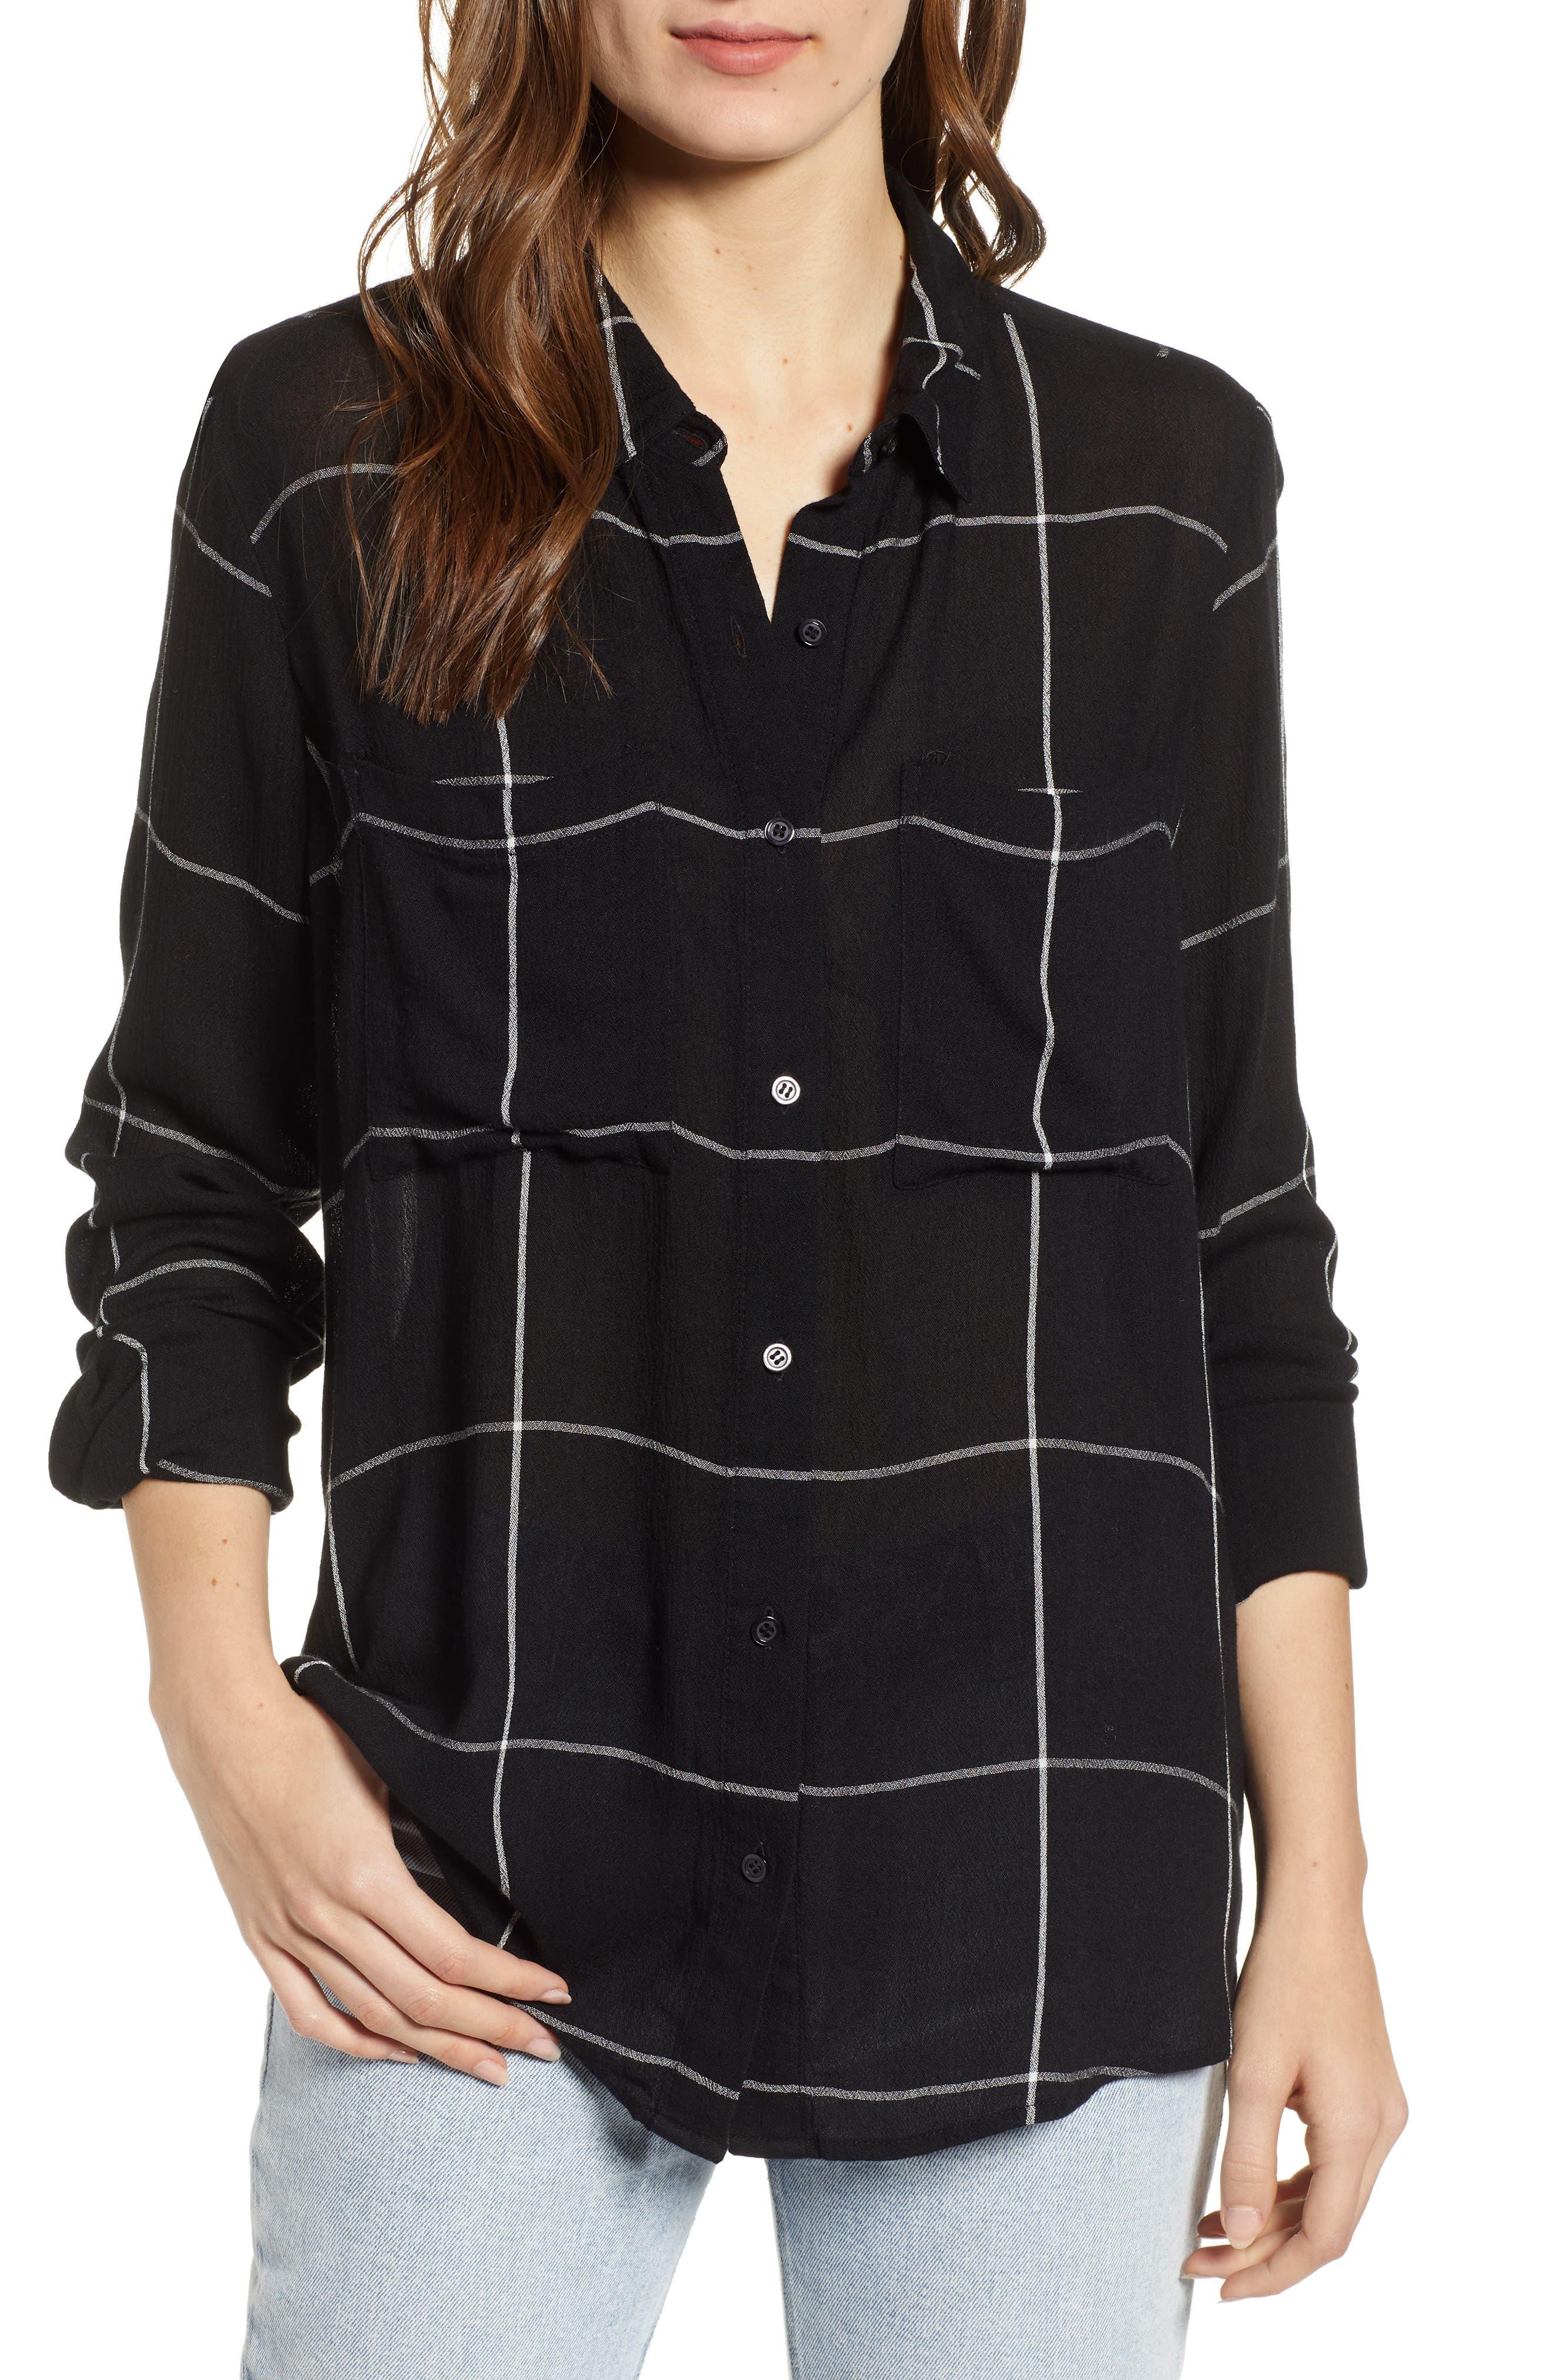 BP.,                             The Perfect Shirt,                             Main thumbnail 1, color,                             BLACK MAZY WINDOW PANE